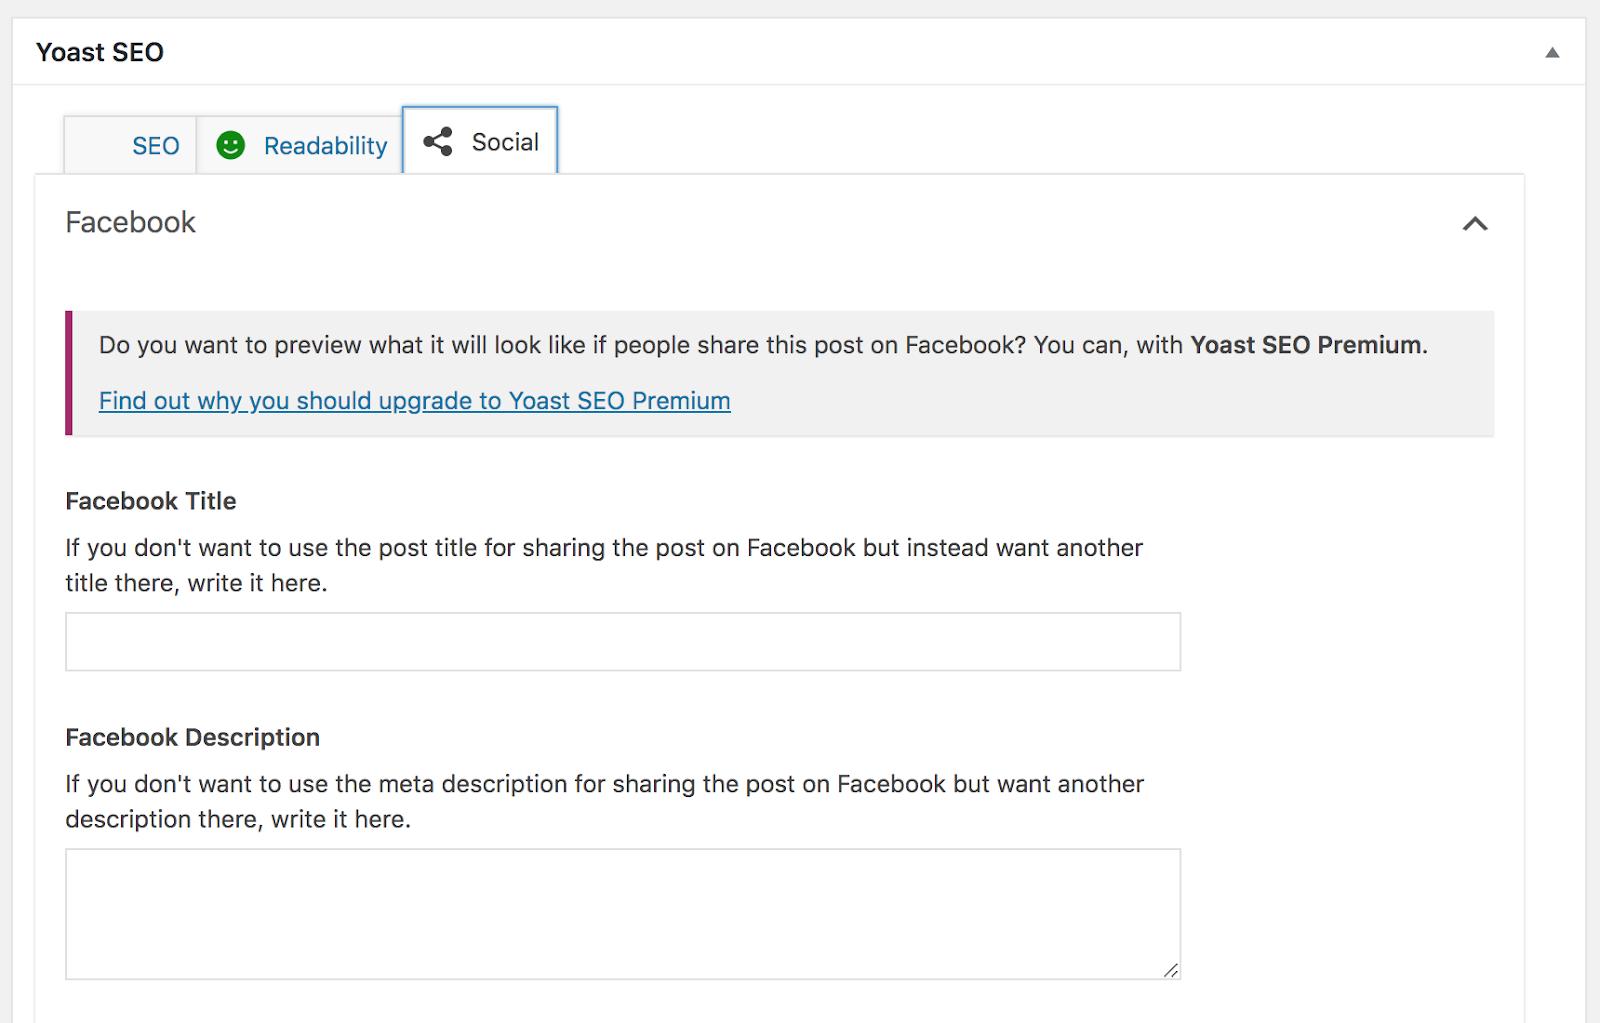 yoast seo plugin for wordpress to add meta descriptions